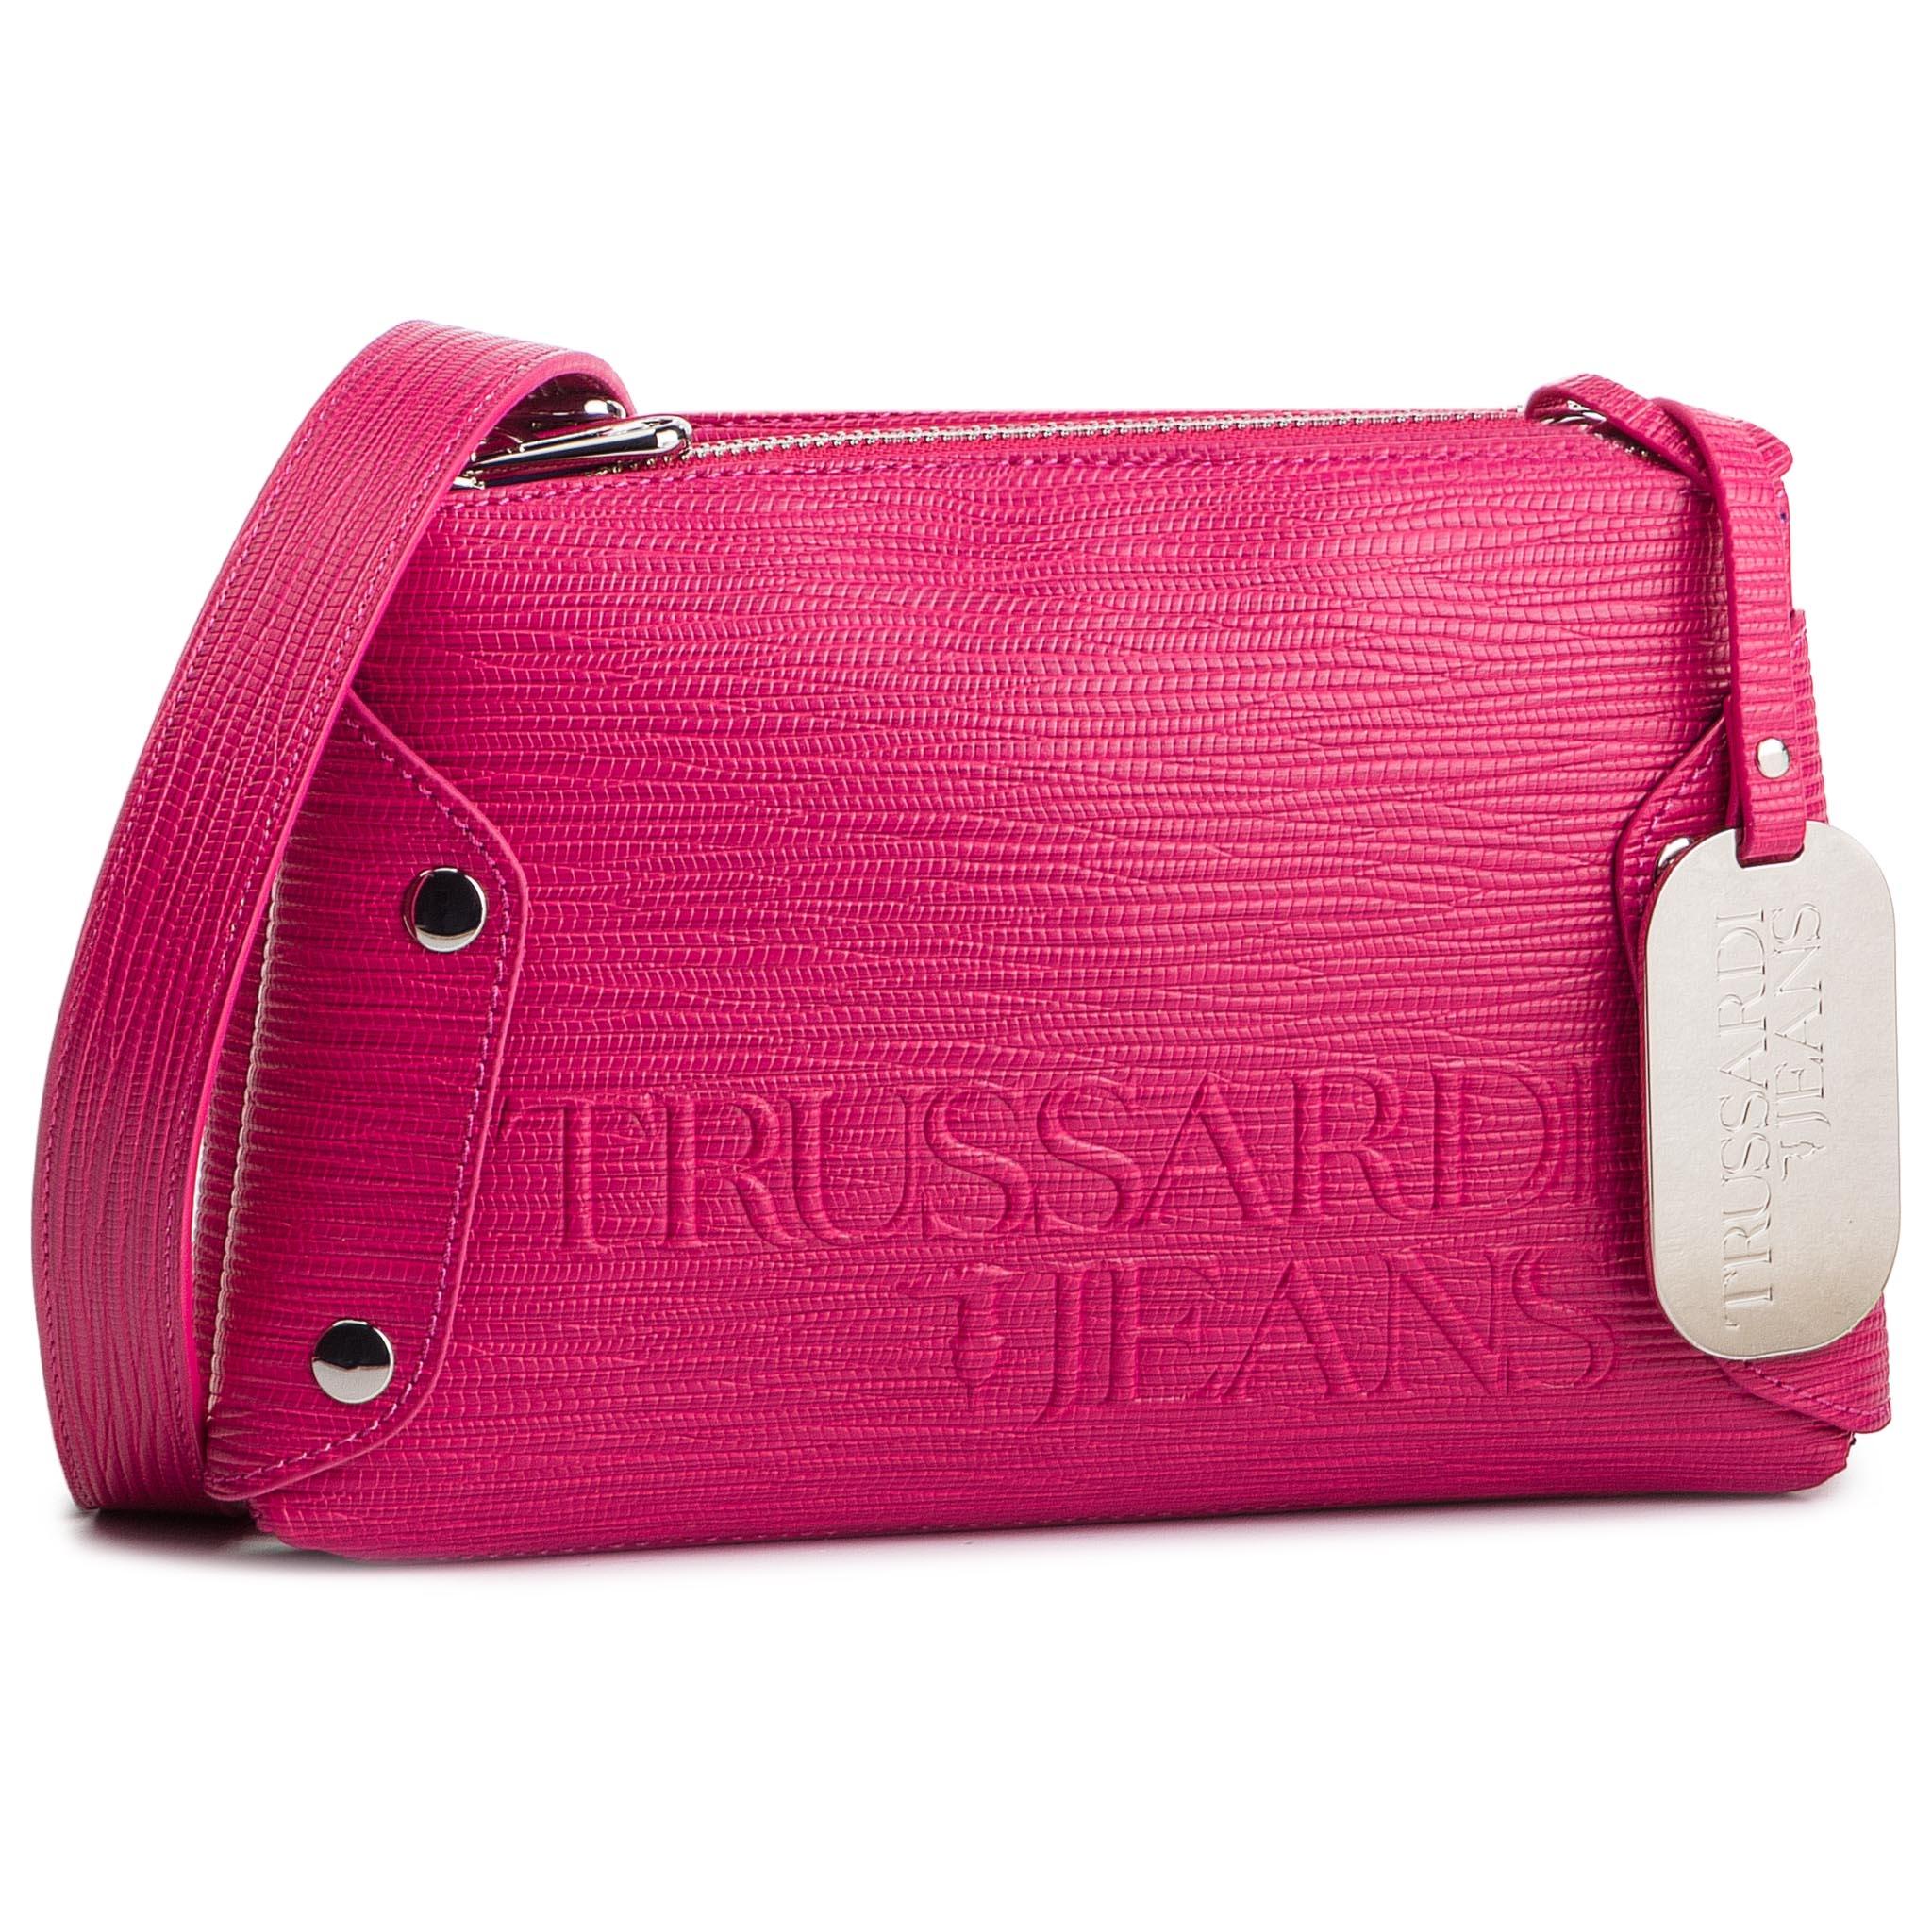 Assistant Tuo Il Personal Shopping Women Donna Rosa Shophallo Borsa wx8R7f7q 15d0a303626